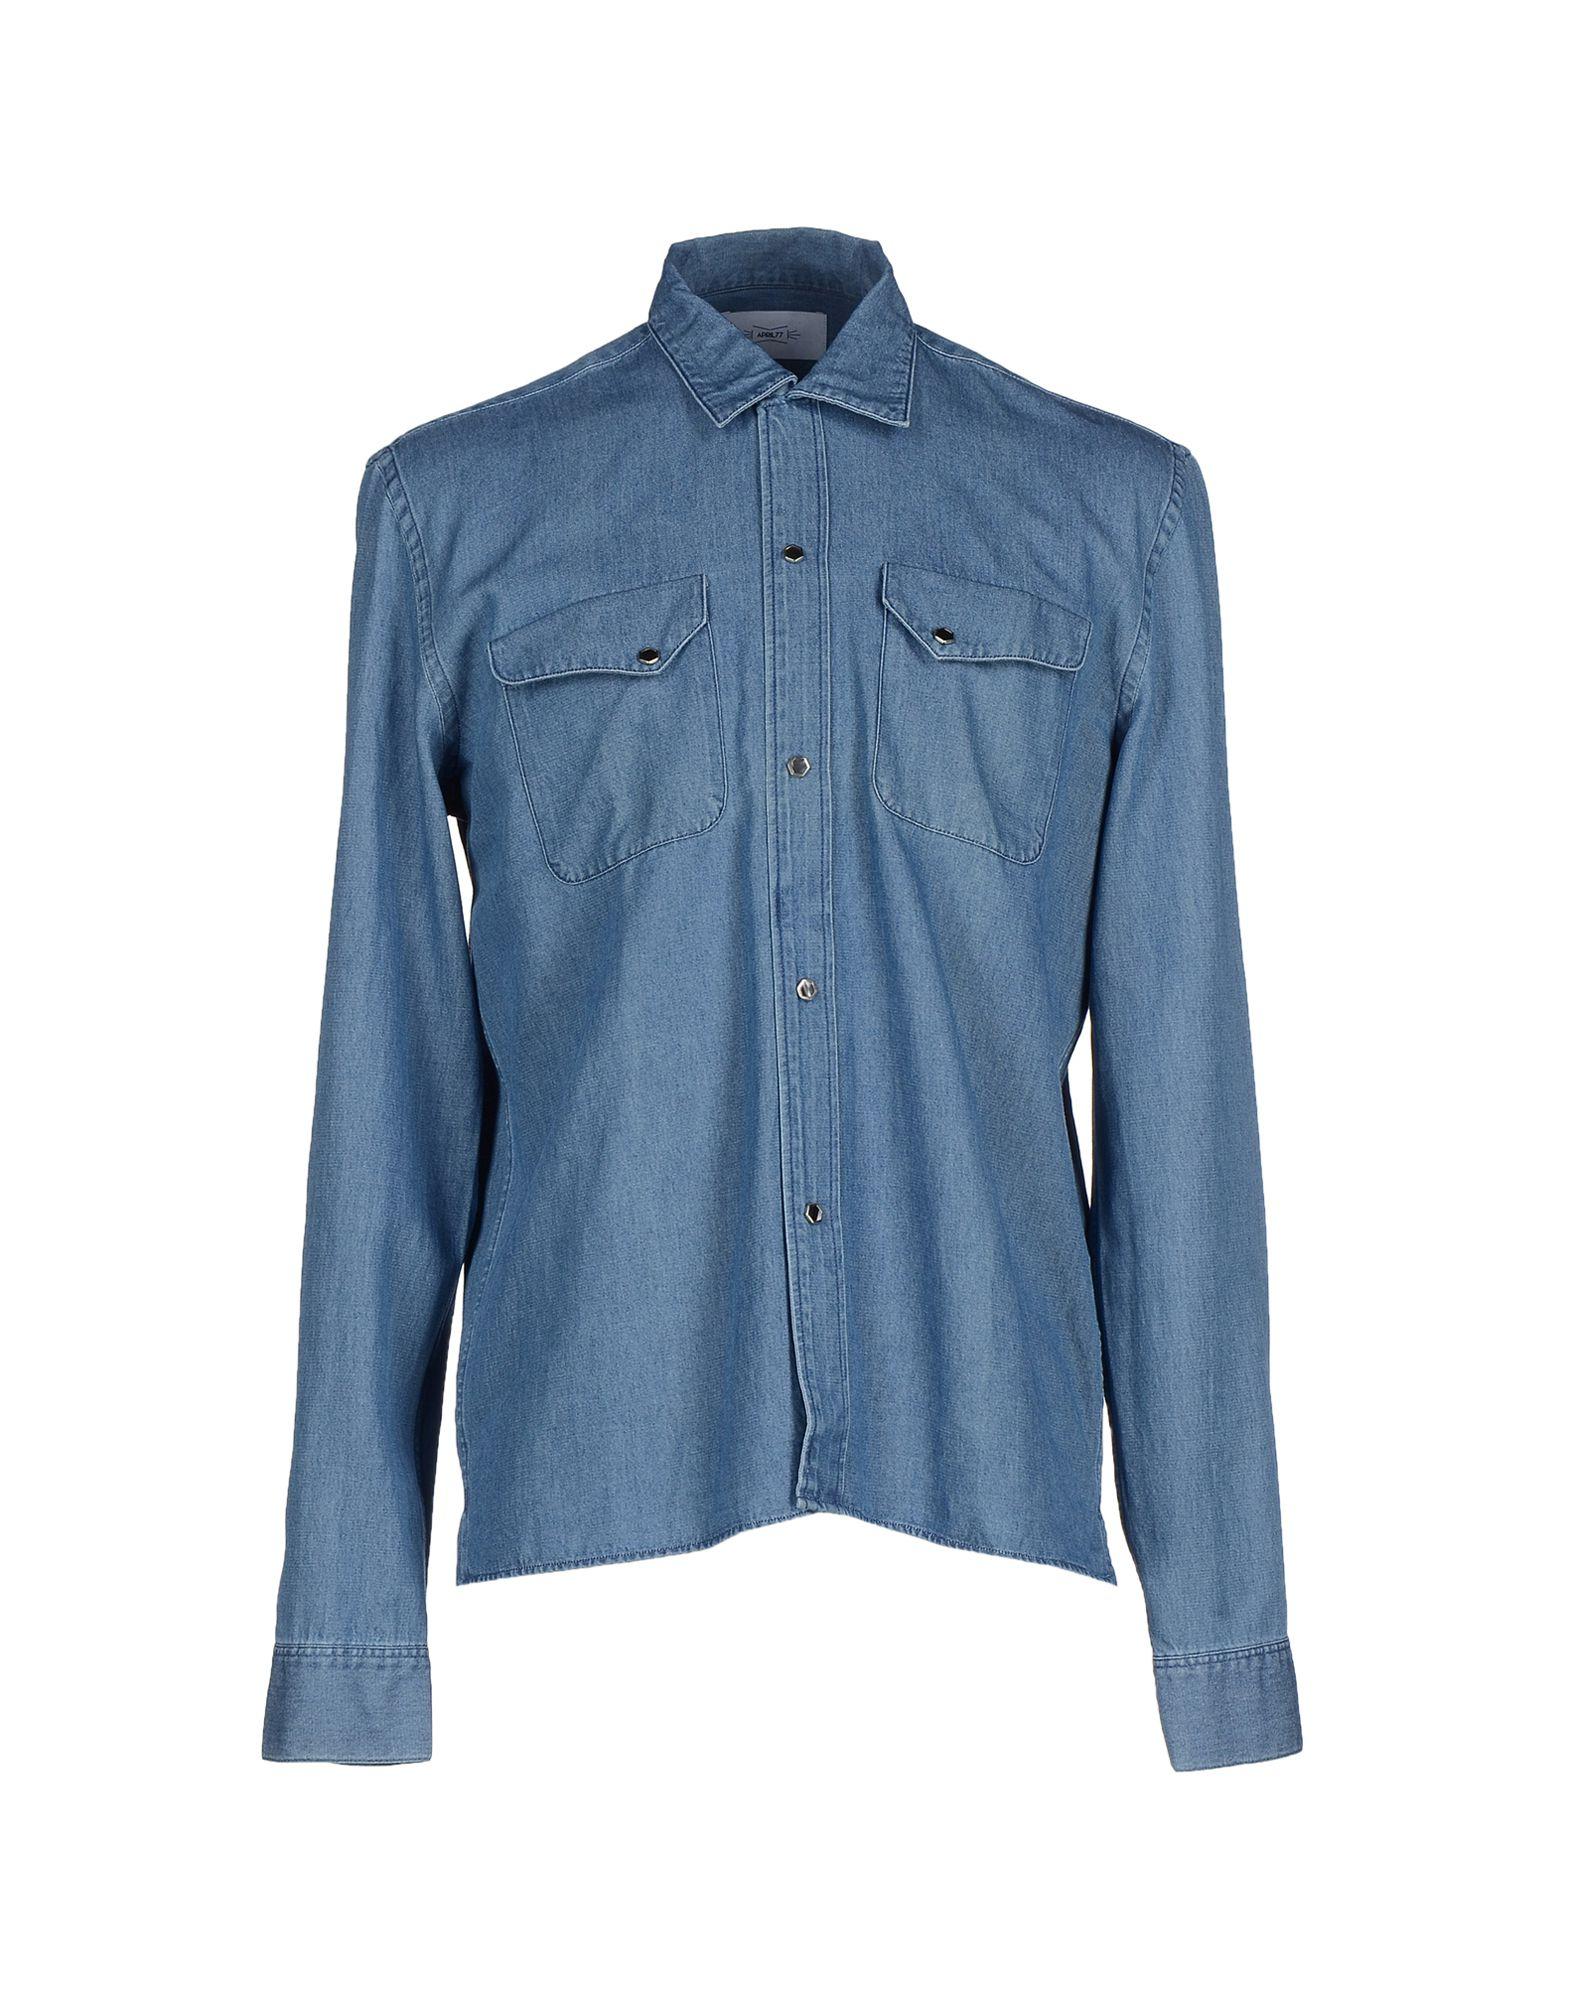 цена APRIL 77 Джинсовая рубашка онлайн в 2017 году